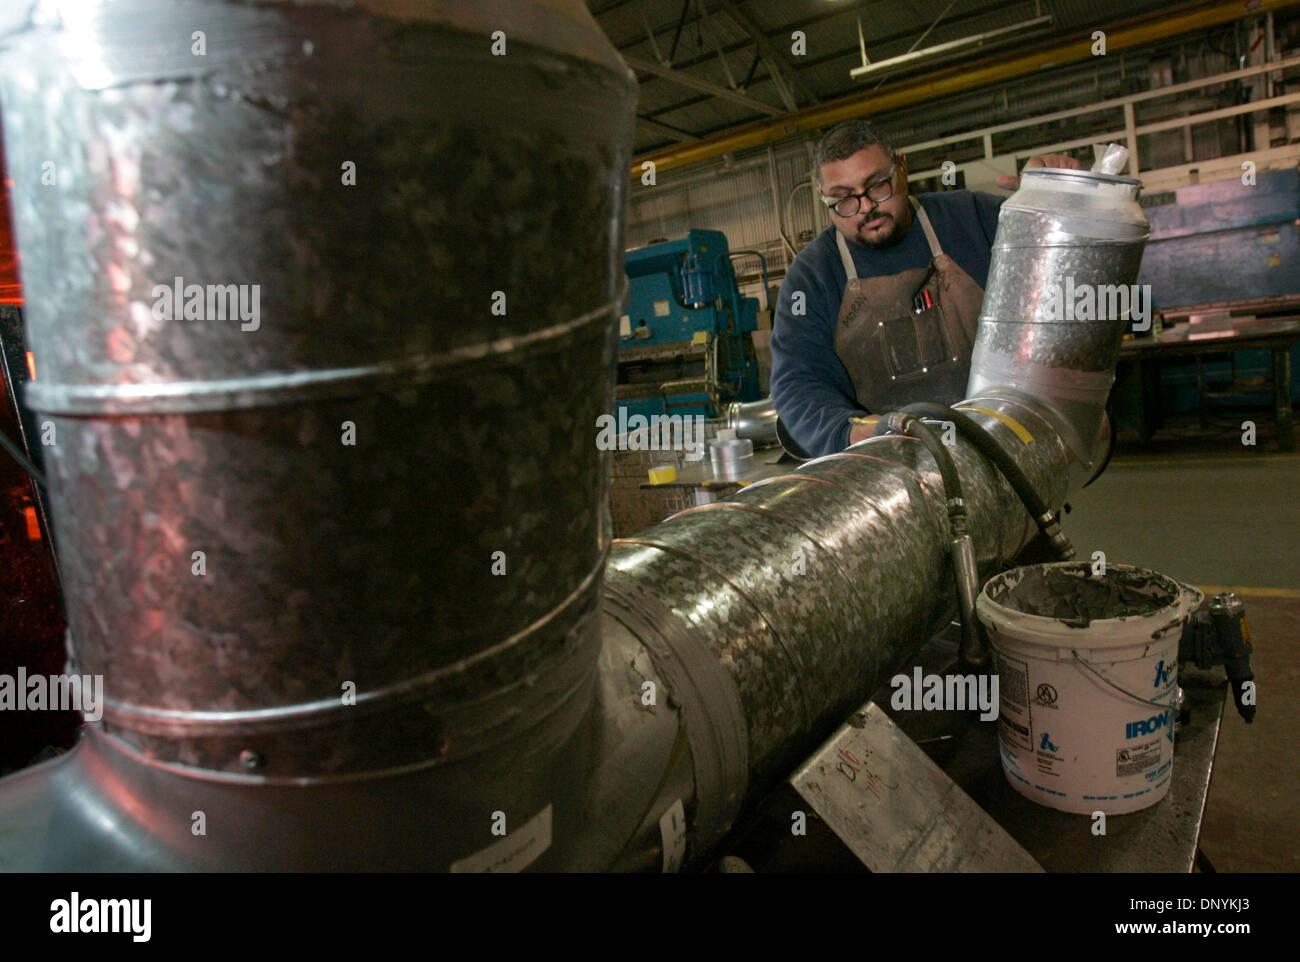 Metal Fabricator Stock Photos & Metal Fabricator Stock